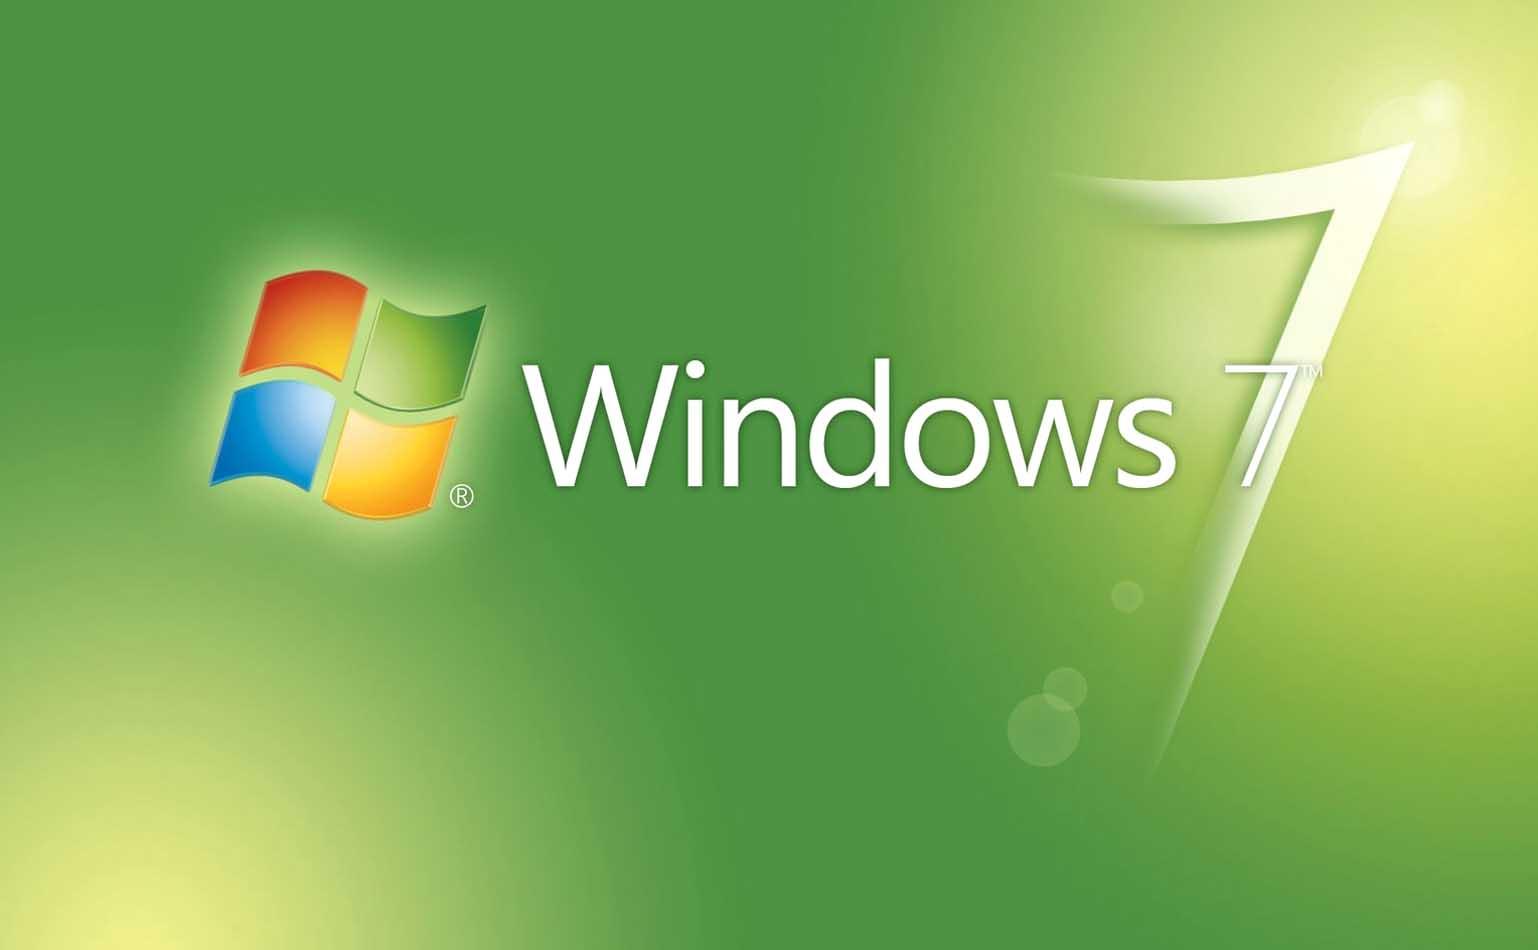 Free Download Wallpaper Downloads Windows 7 Laptop Nature